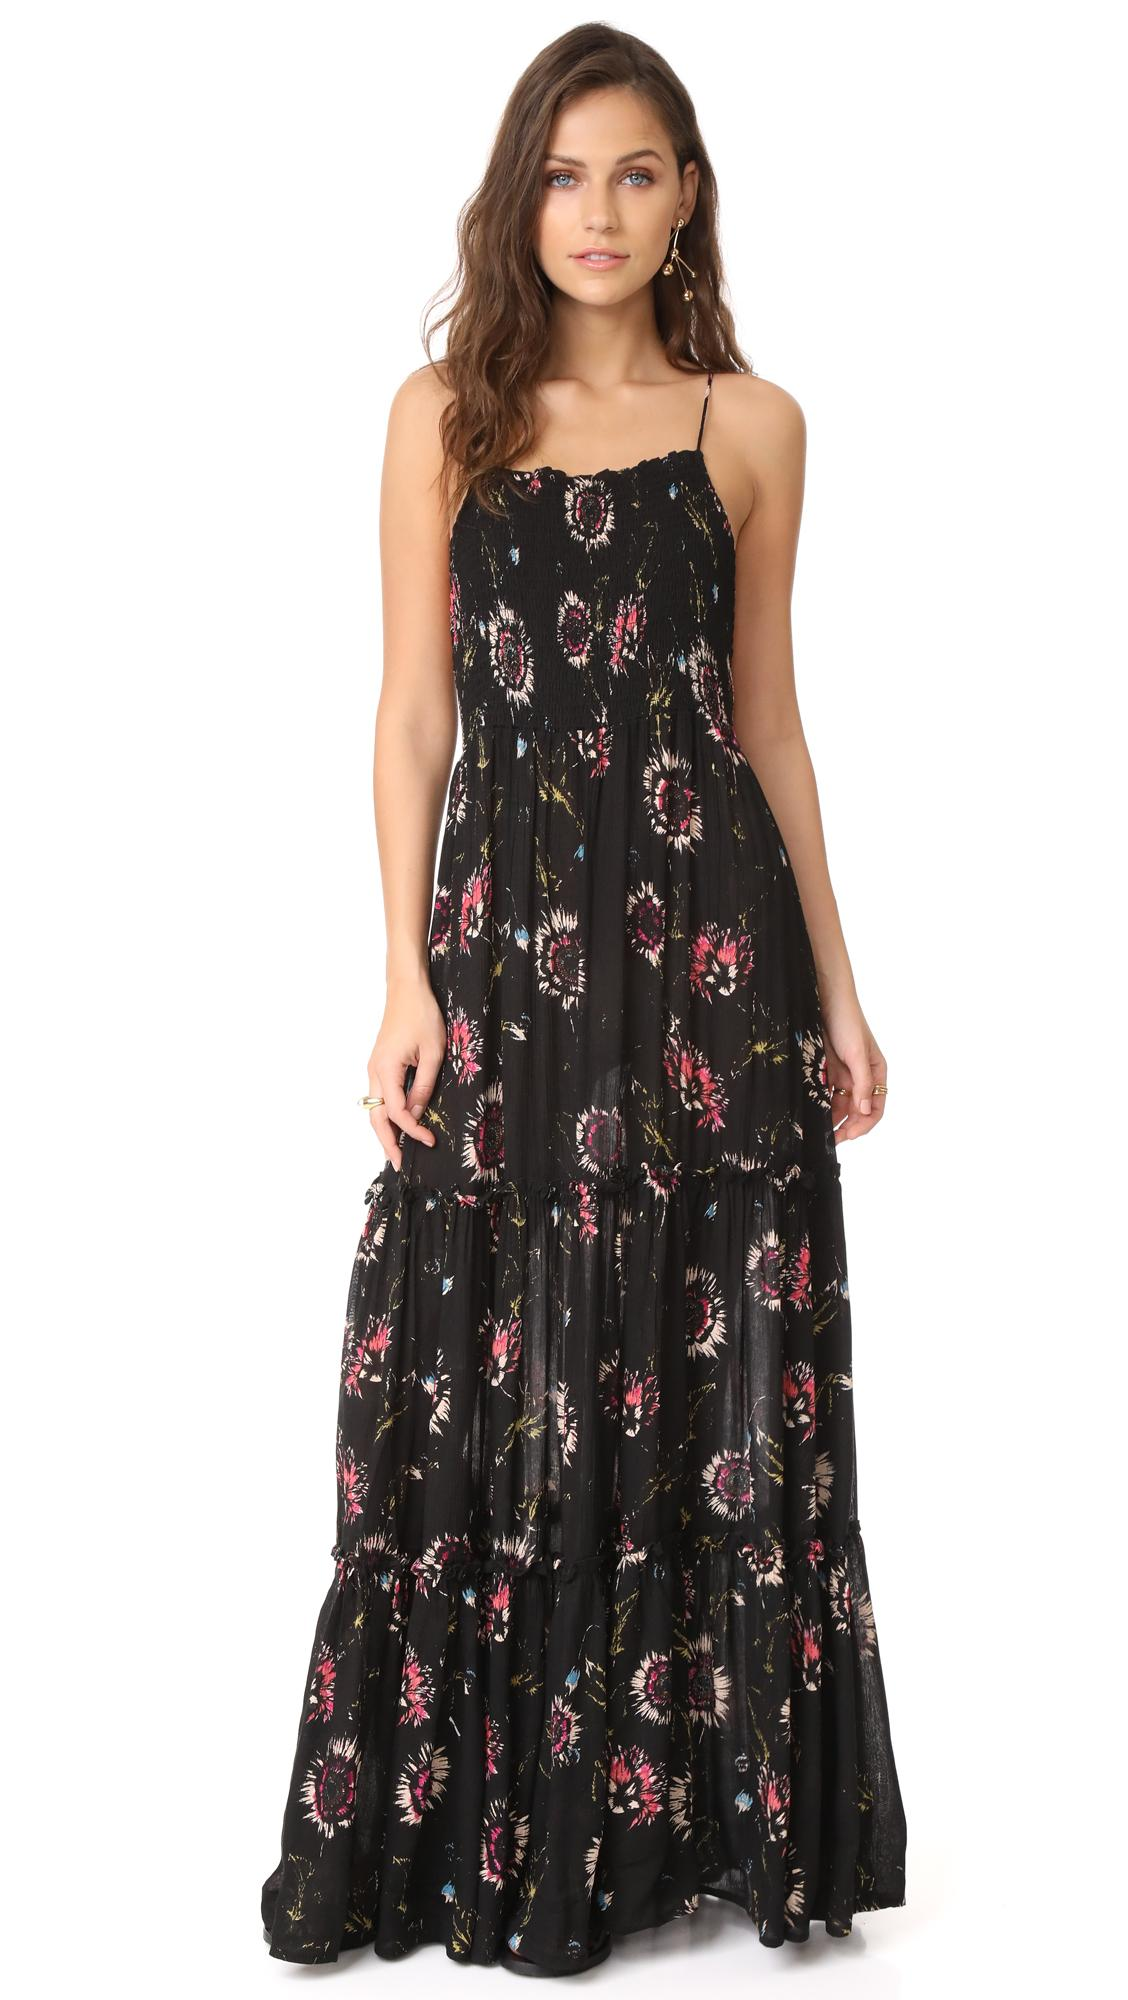 dd3ed5795b9 Garden Party Maxi Dress in Black Combo